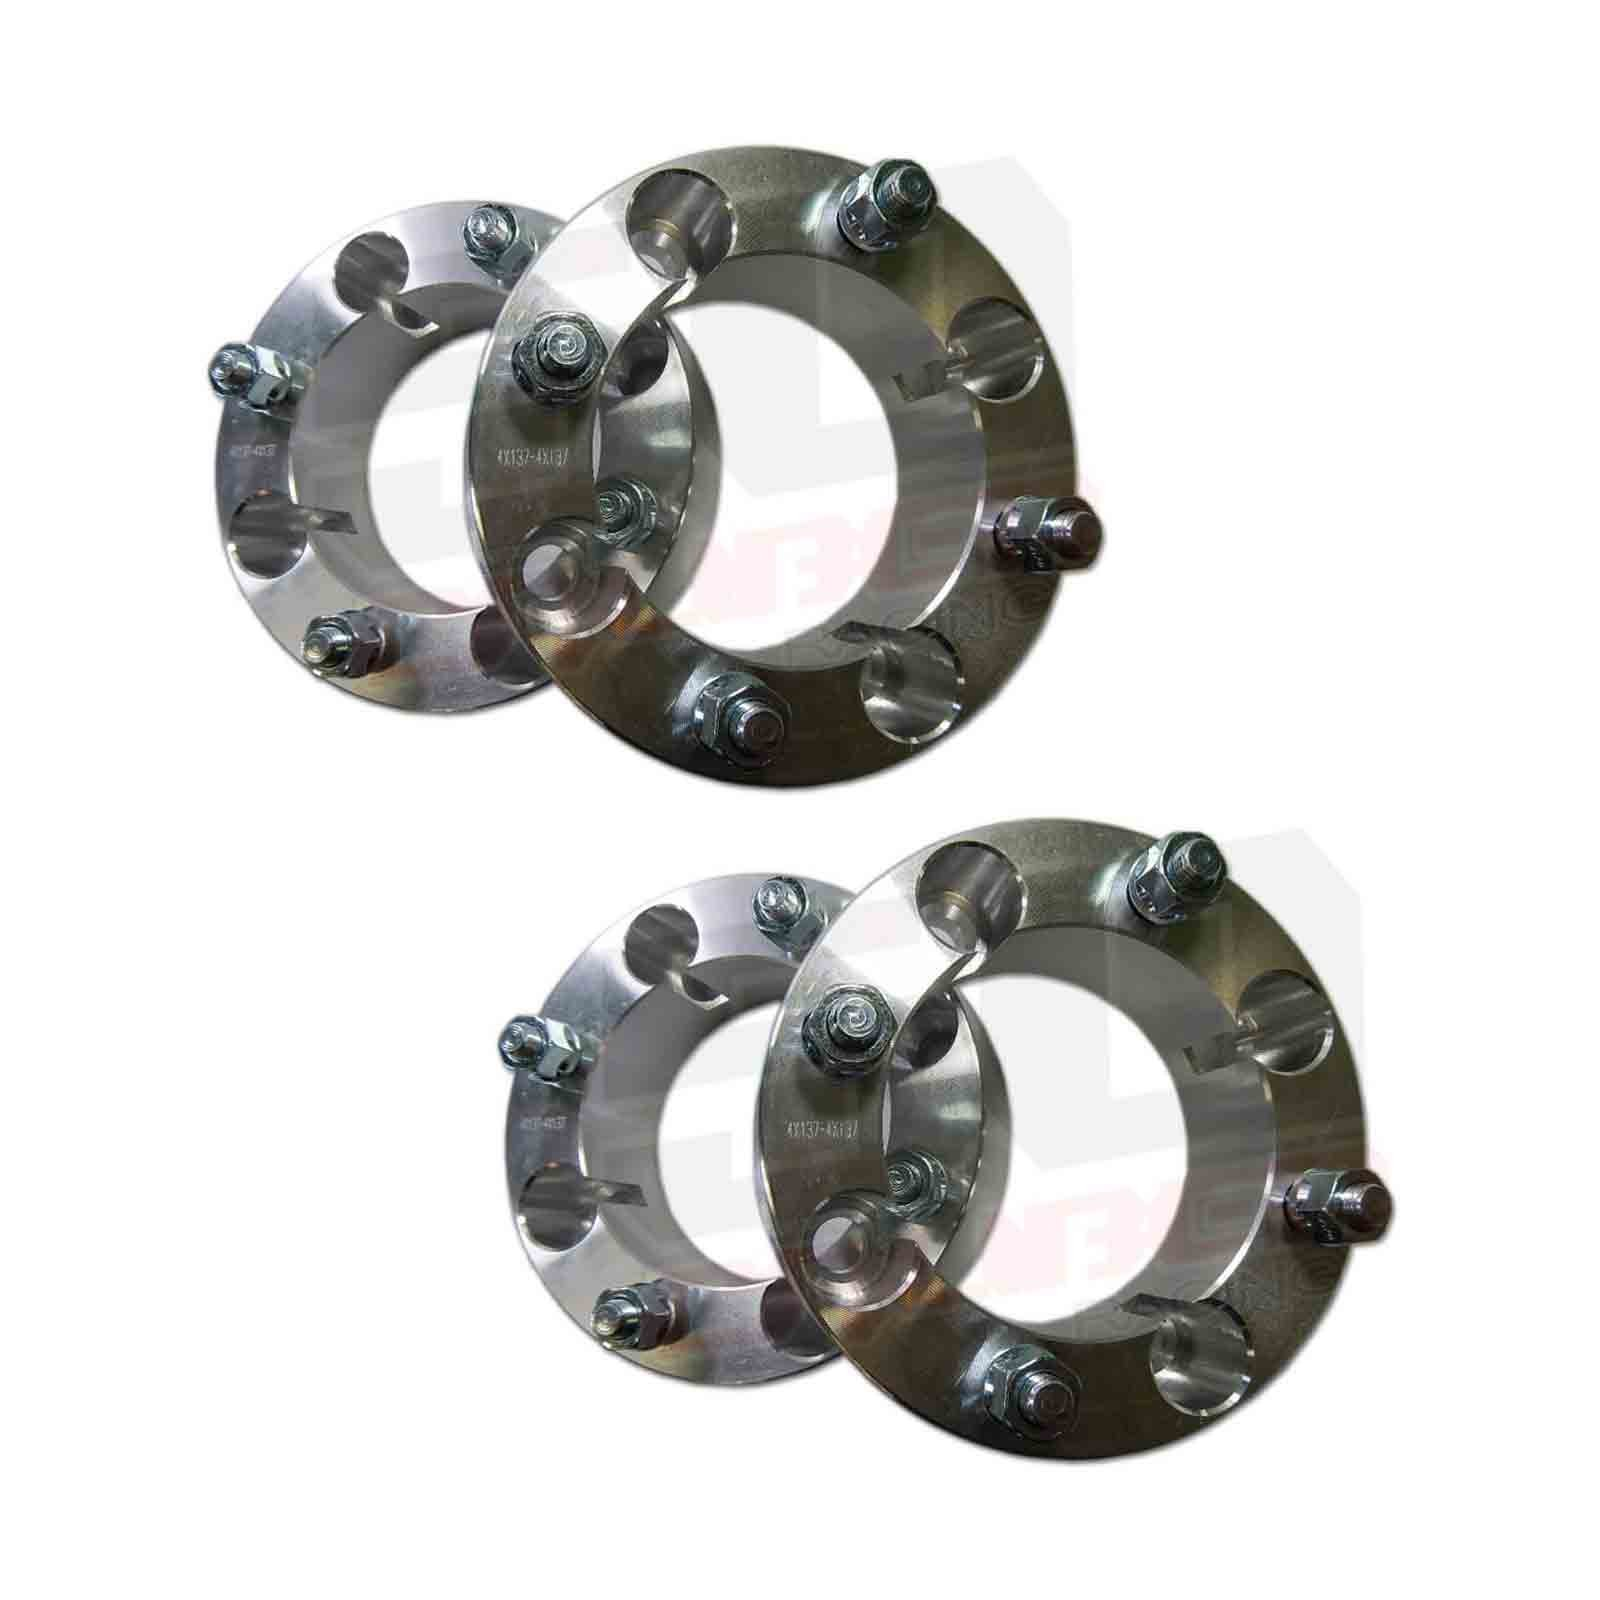 Set of Four (4) Wheel Spacers - 4x137 - 2 inch thick - 12x1.25mm Studs - Fit Kawasaki Teryx , Teryx4 [5217-A1]